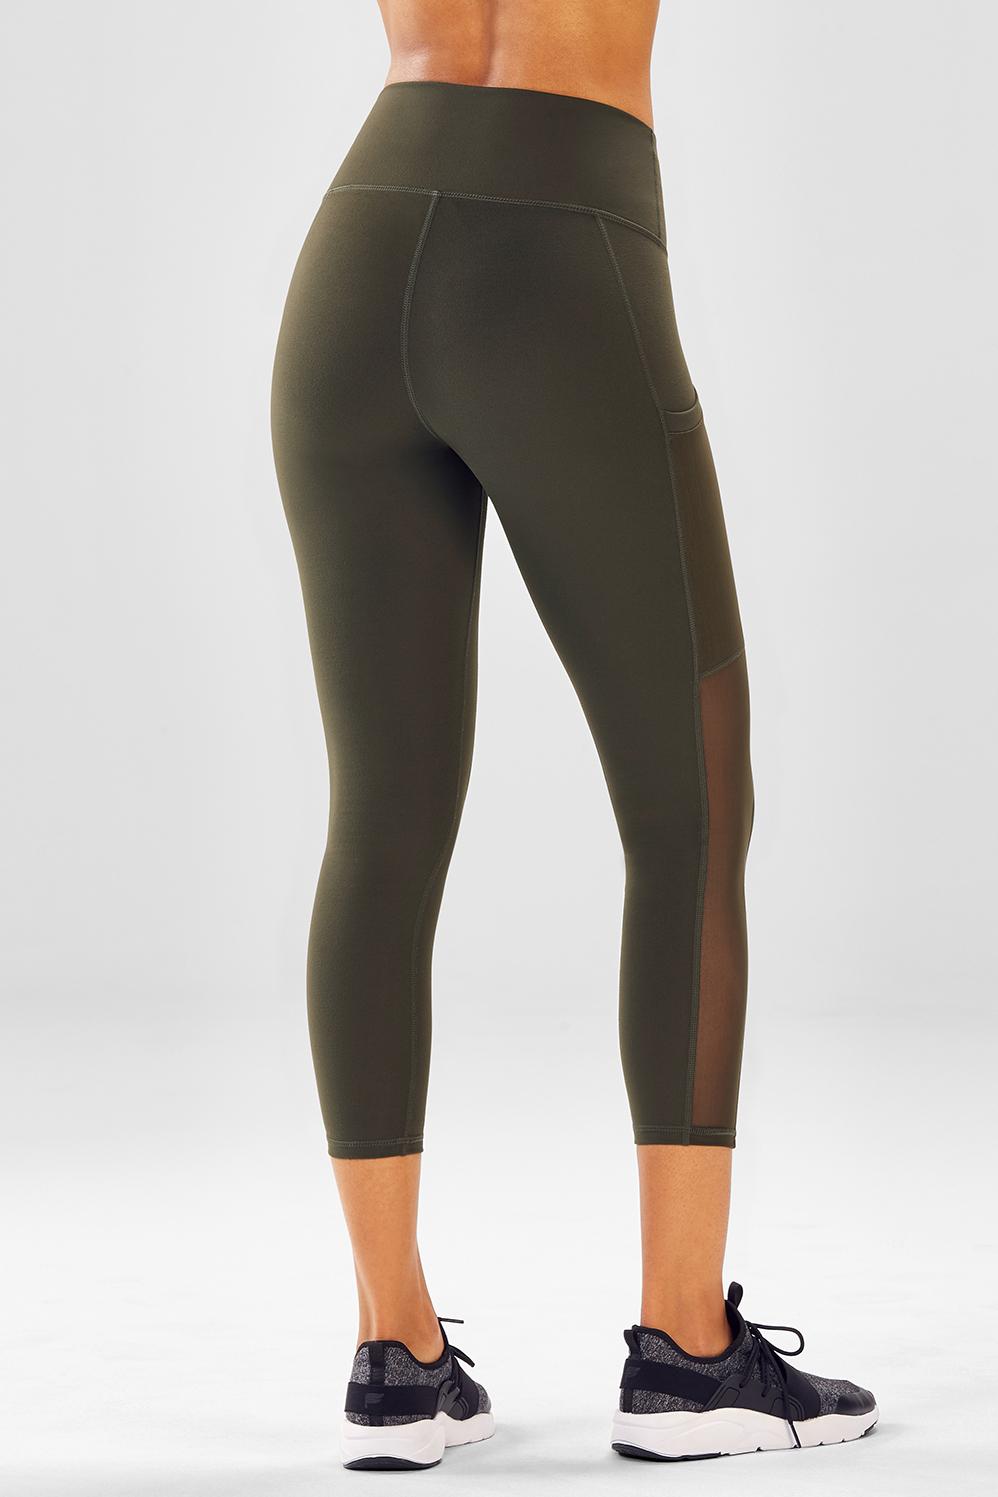 Solid Black Size L Women/'s Fabletics Mila Pocket High Waisted Capri